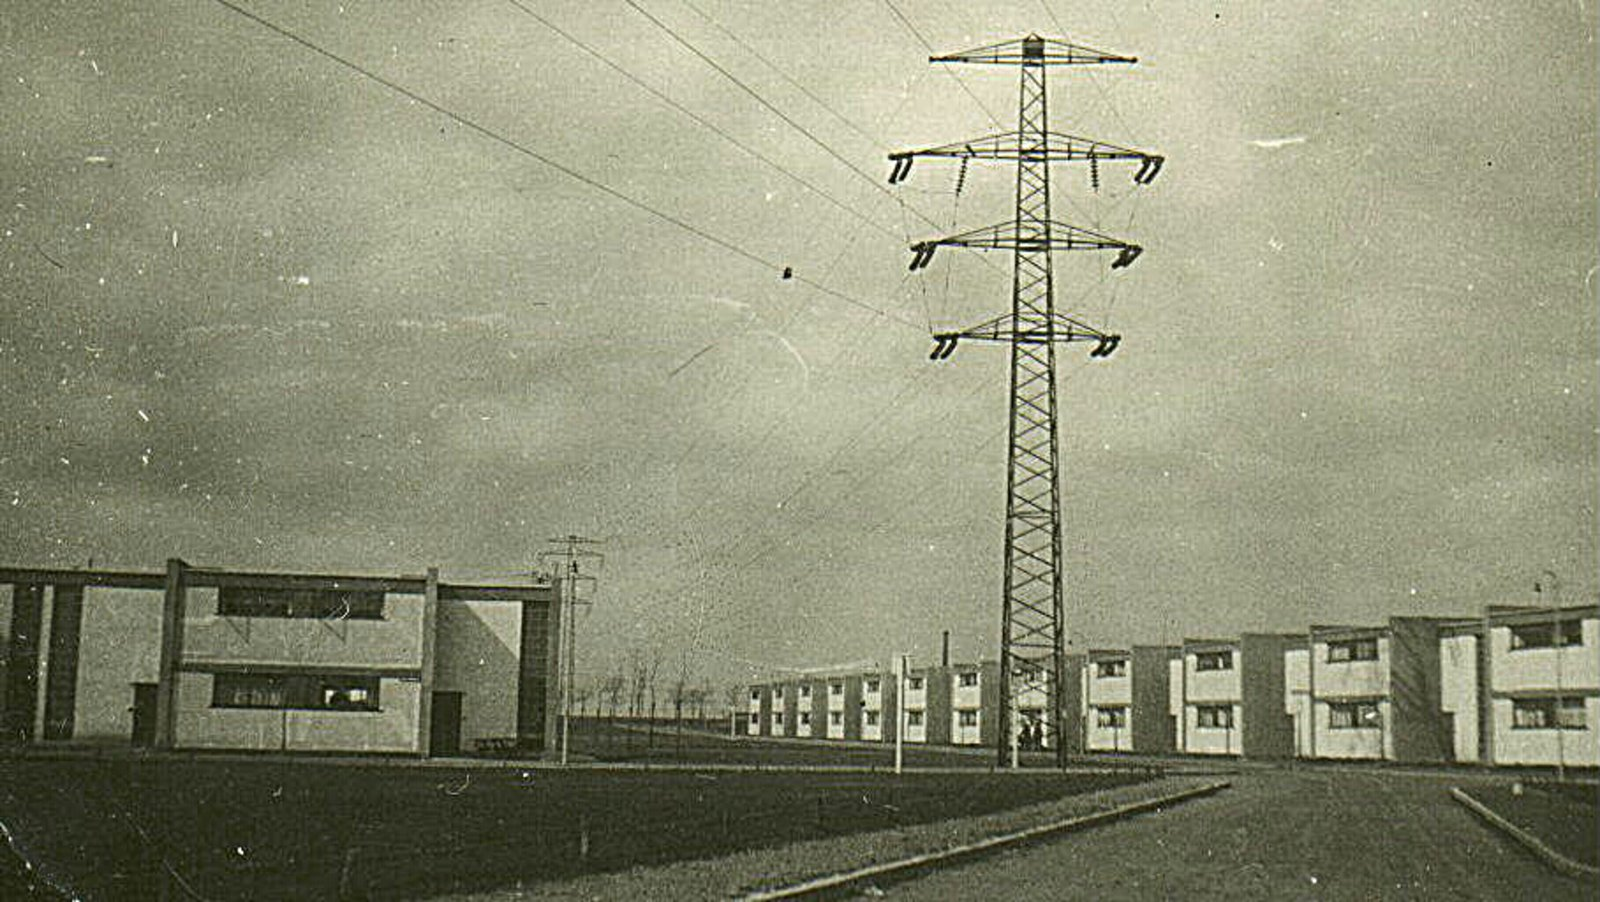 Bauhaussiedlung Dessau–Törten (1926–28) Walter Gropius